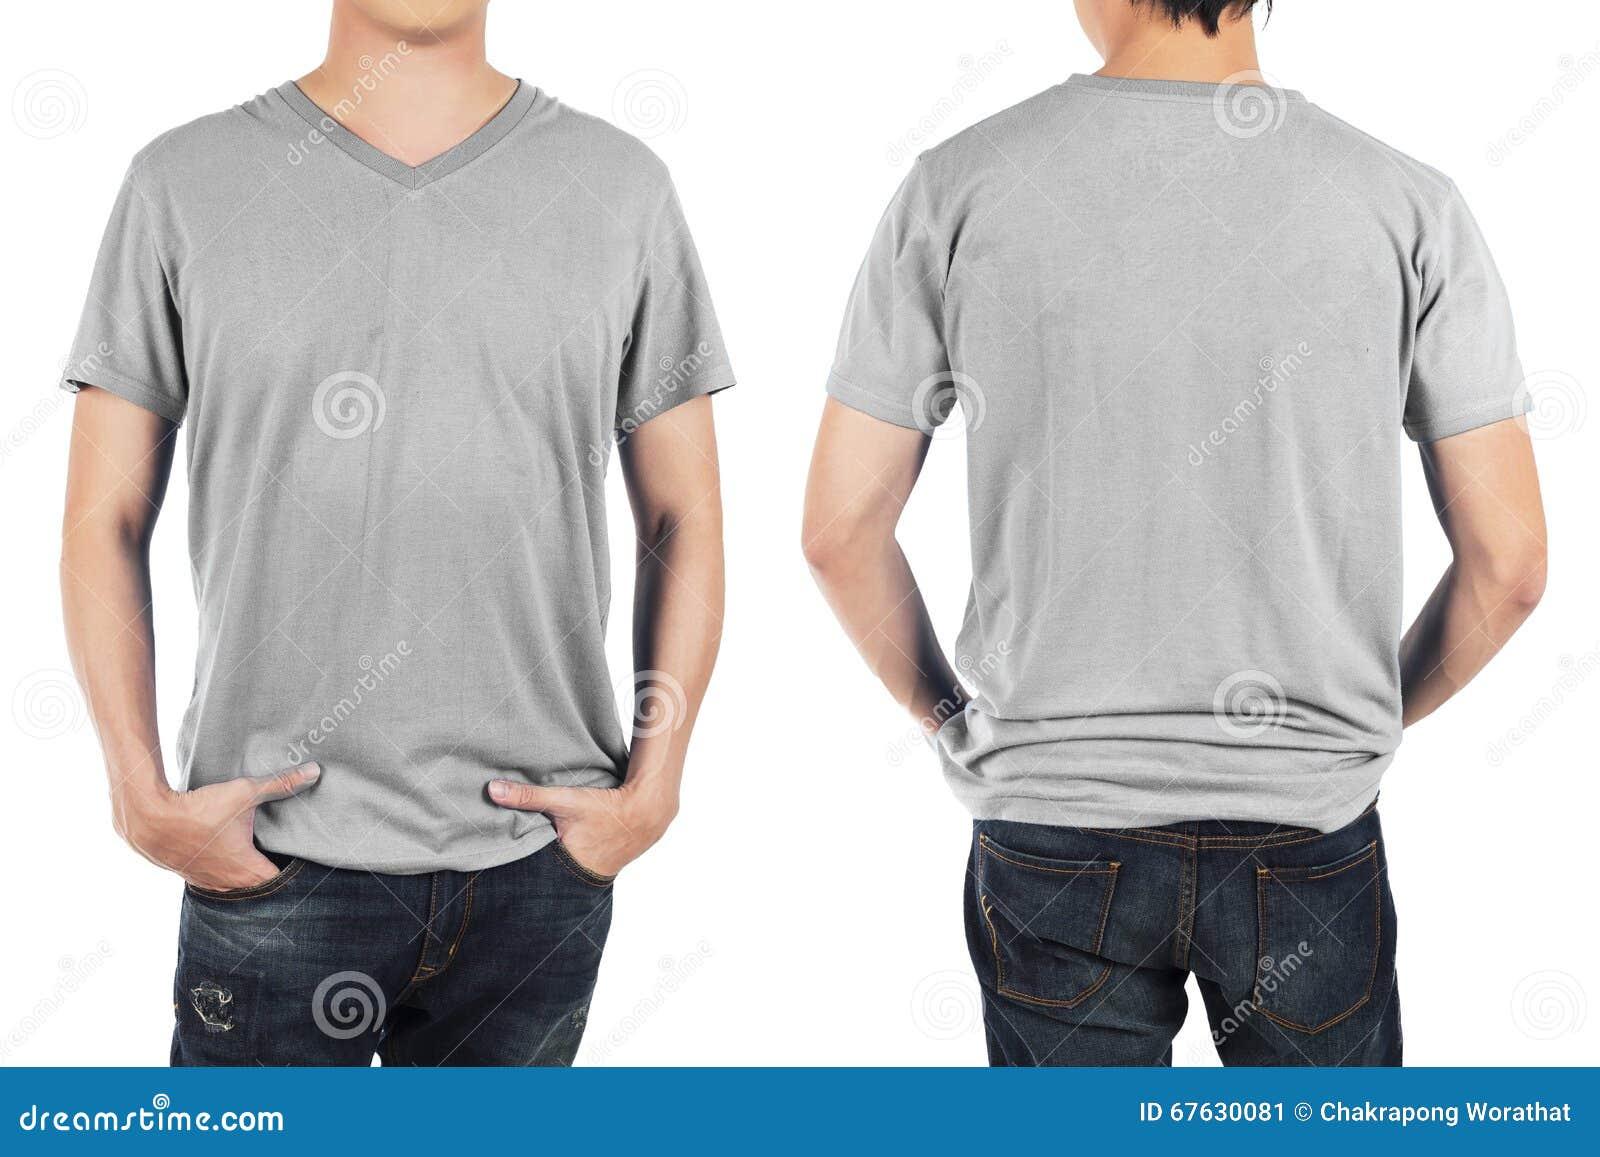 blank t shirt front and back grey wwwimgkidcom the